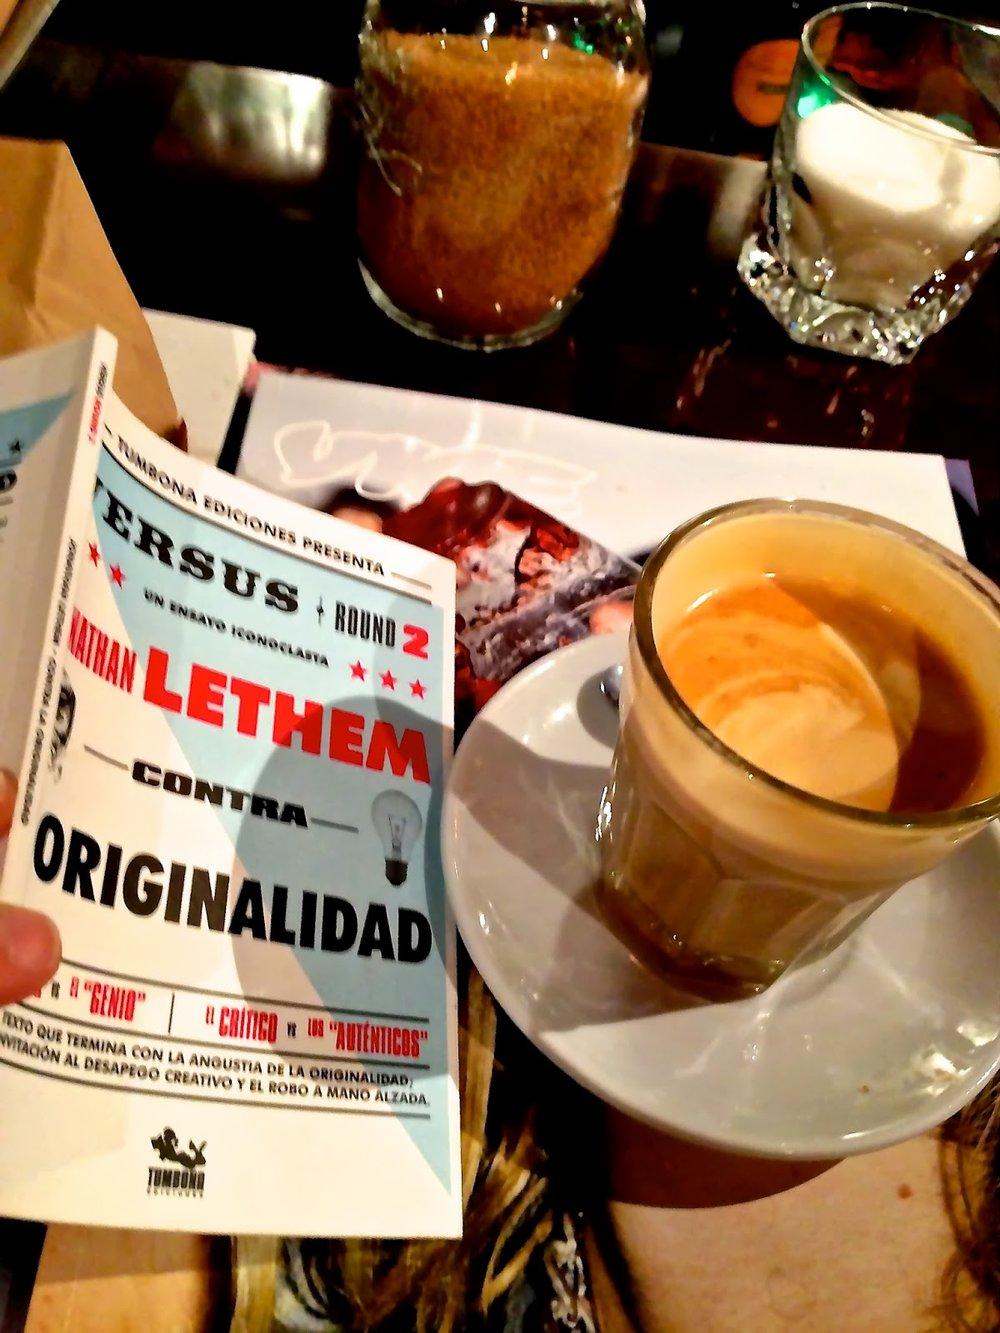 Jonathan-Lethem-Originalidad.jpg